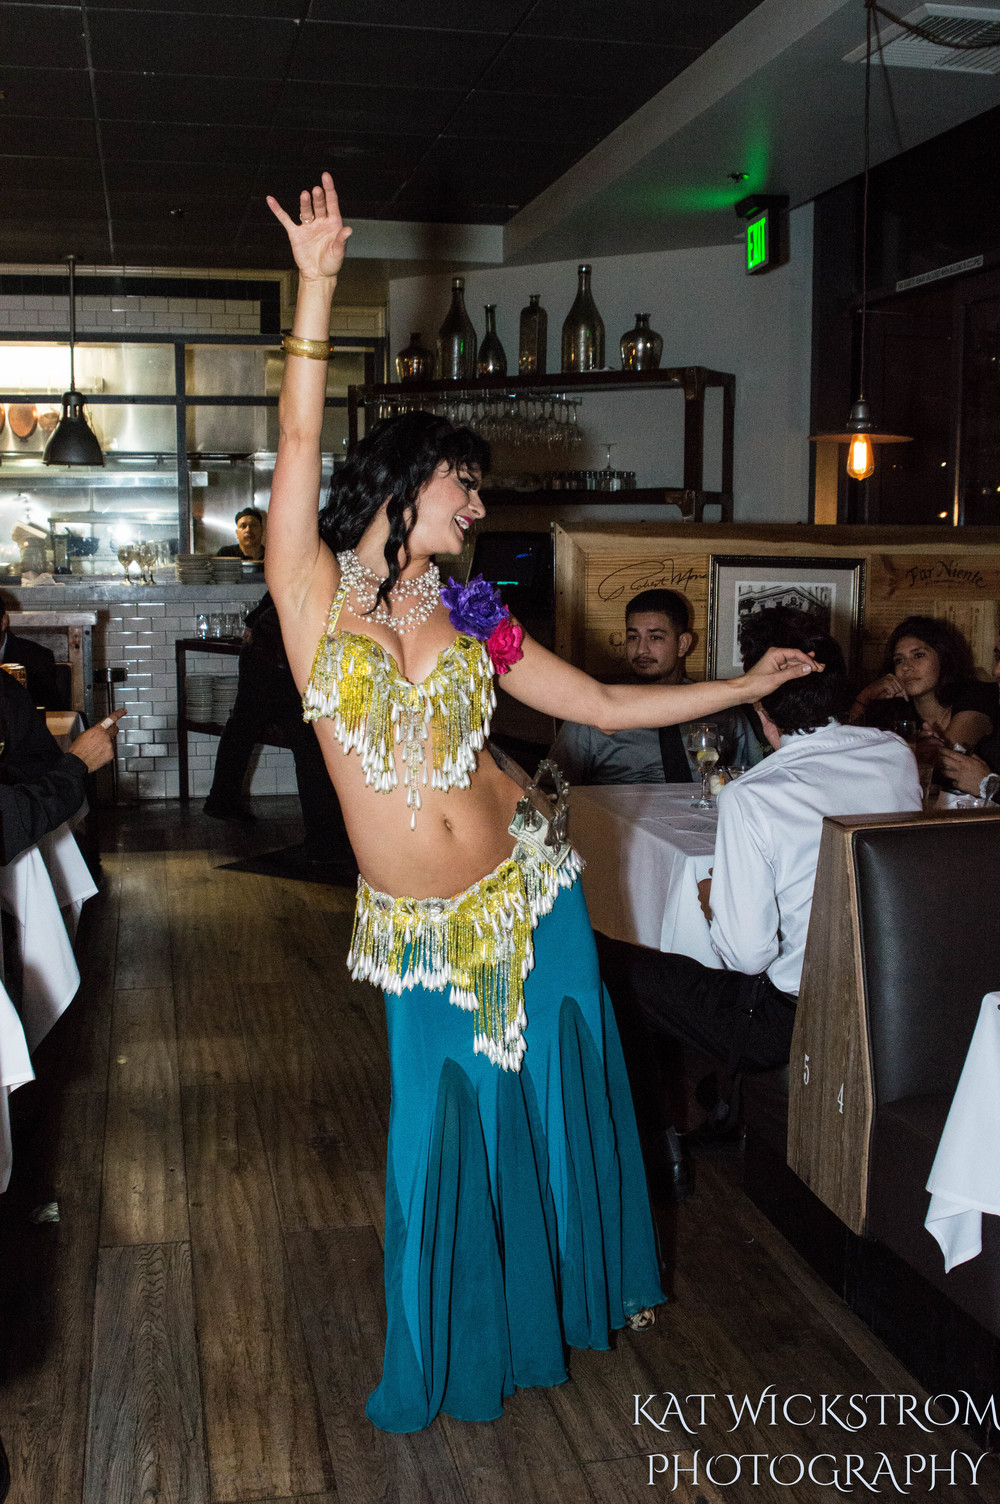 Woodland Hills Cafe Fiore Wedding Reception Belly Dancer